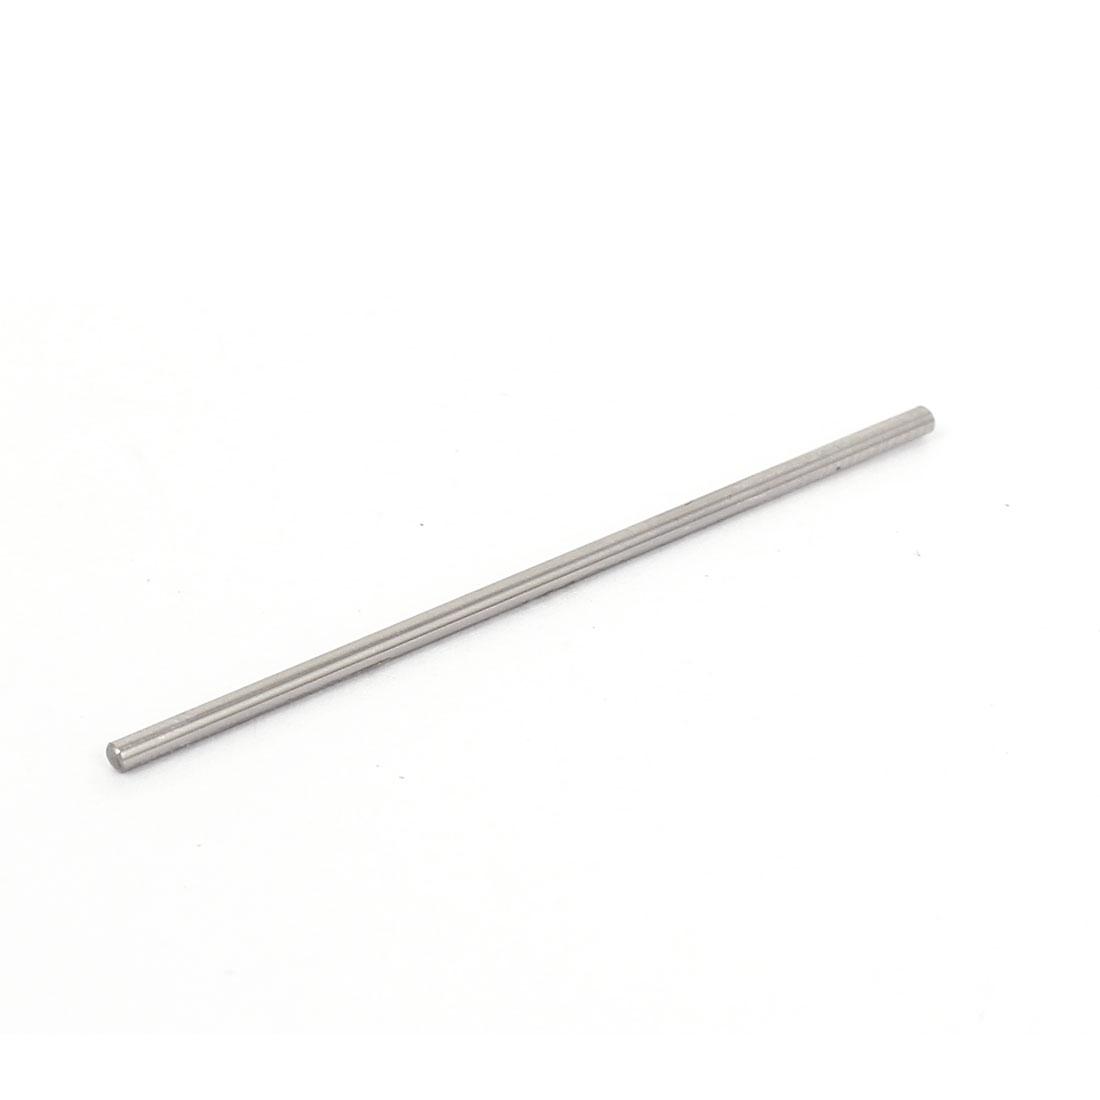 1.52mm Diameter 50mm Length Tungsten Carbide Pin Gage Gauge